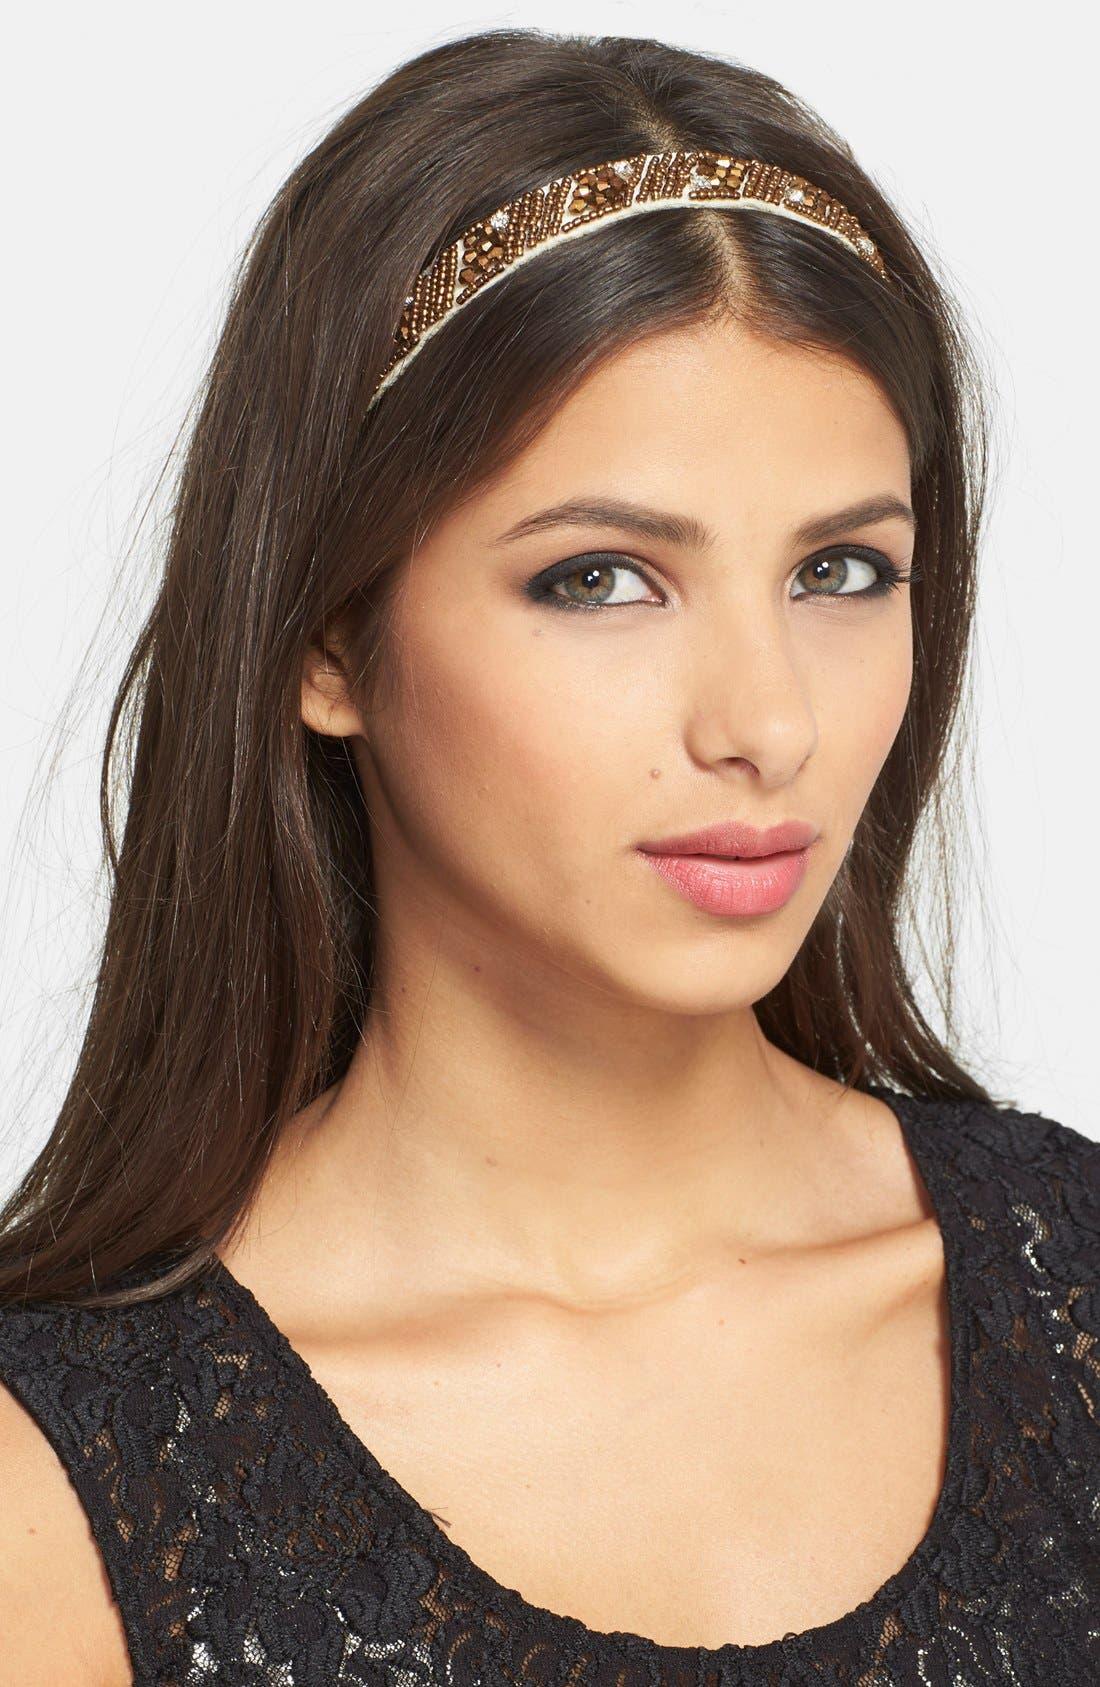 Alternate Image 1 Selected - Tasha 'Royal Beads' Head Wrap